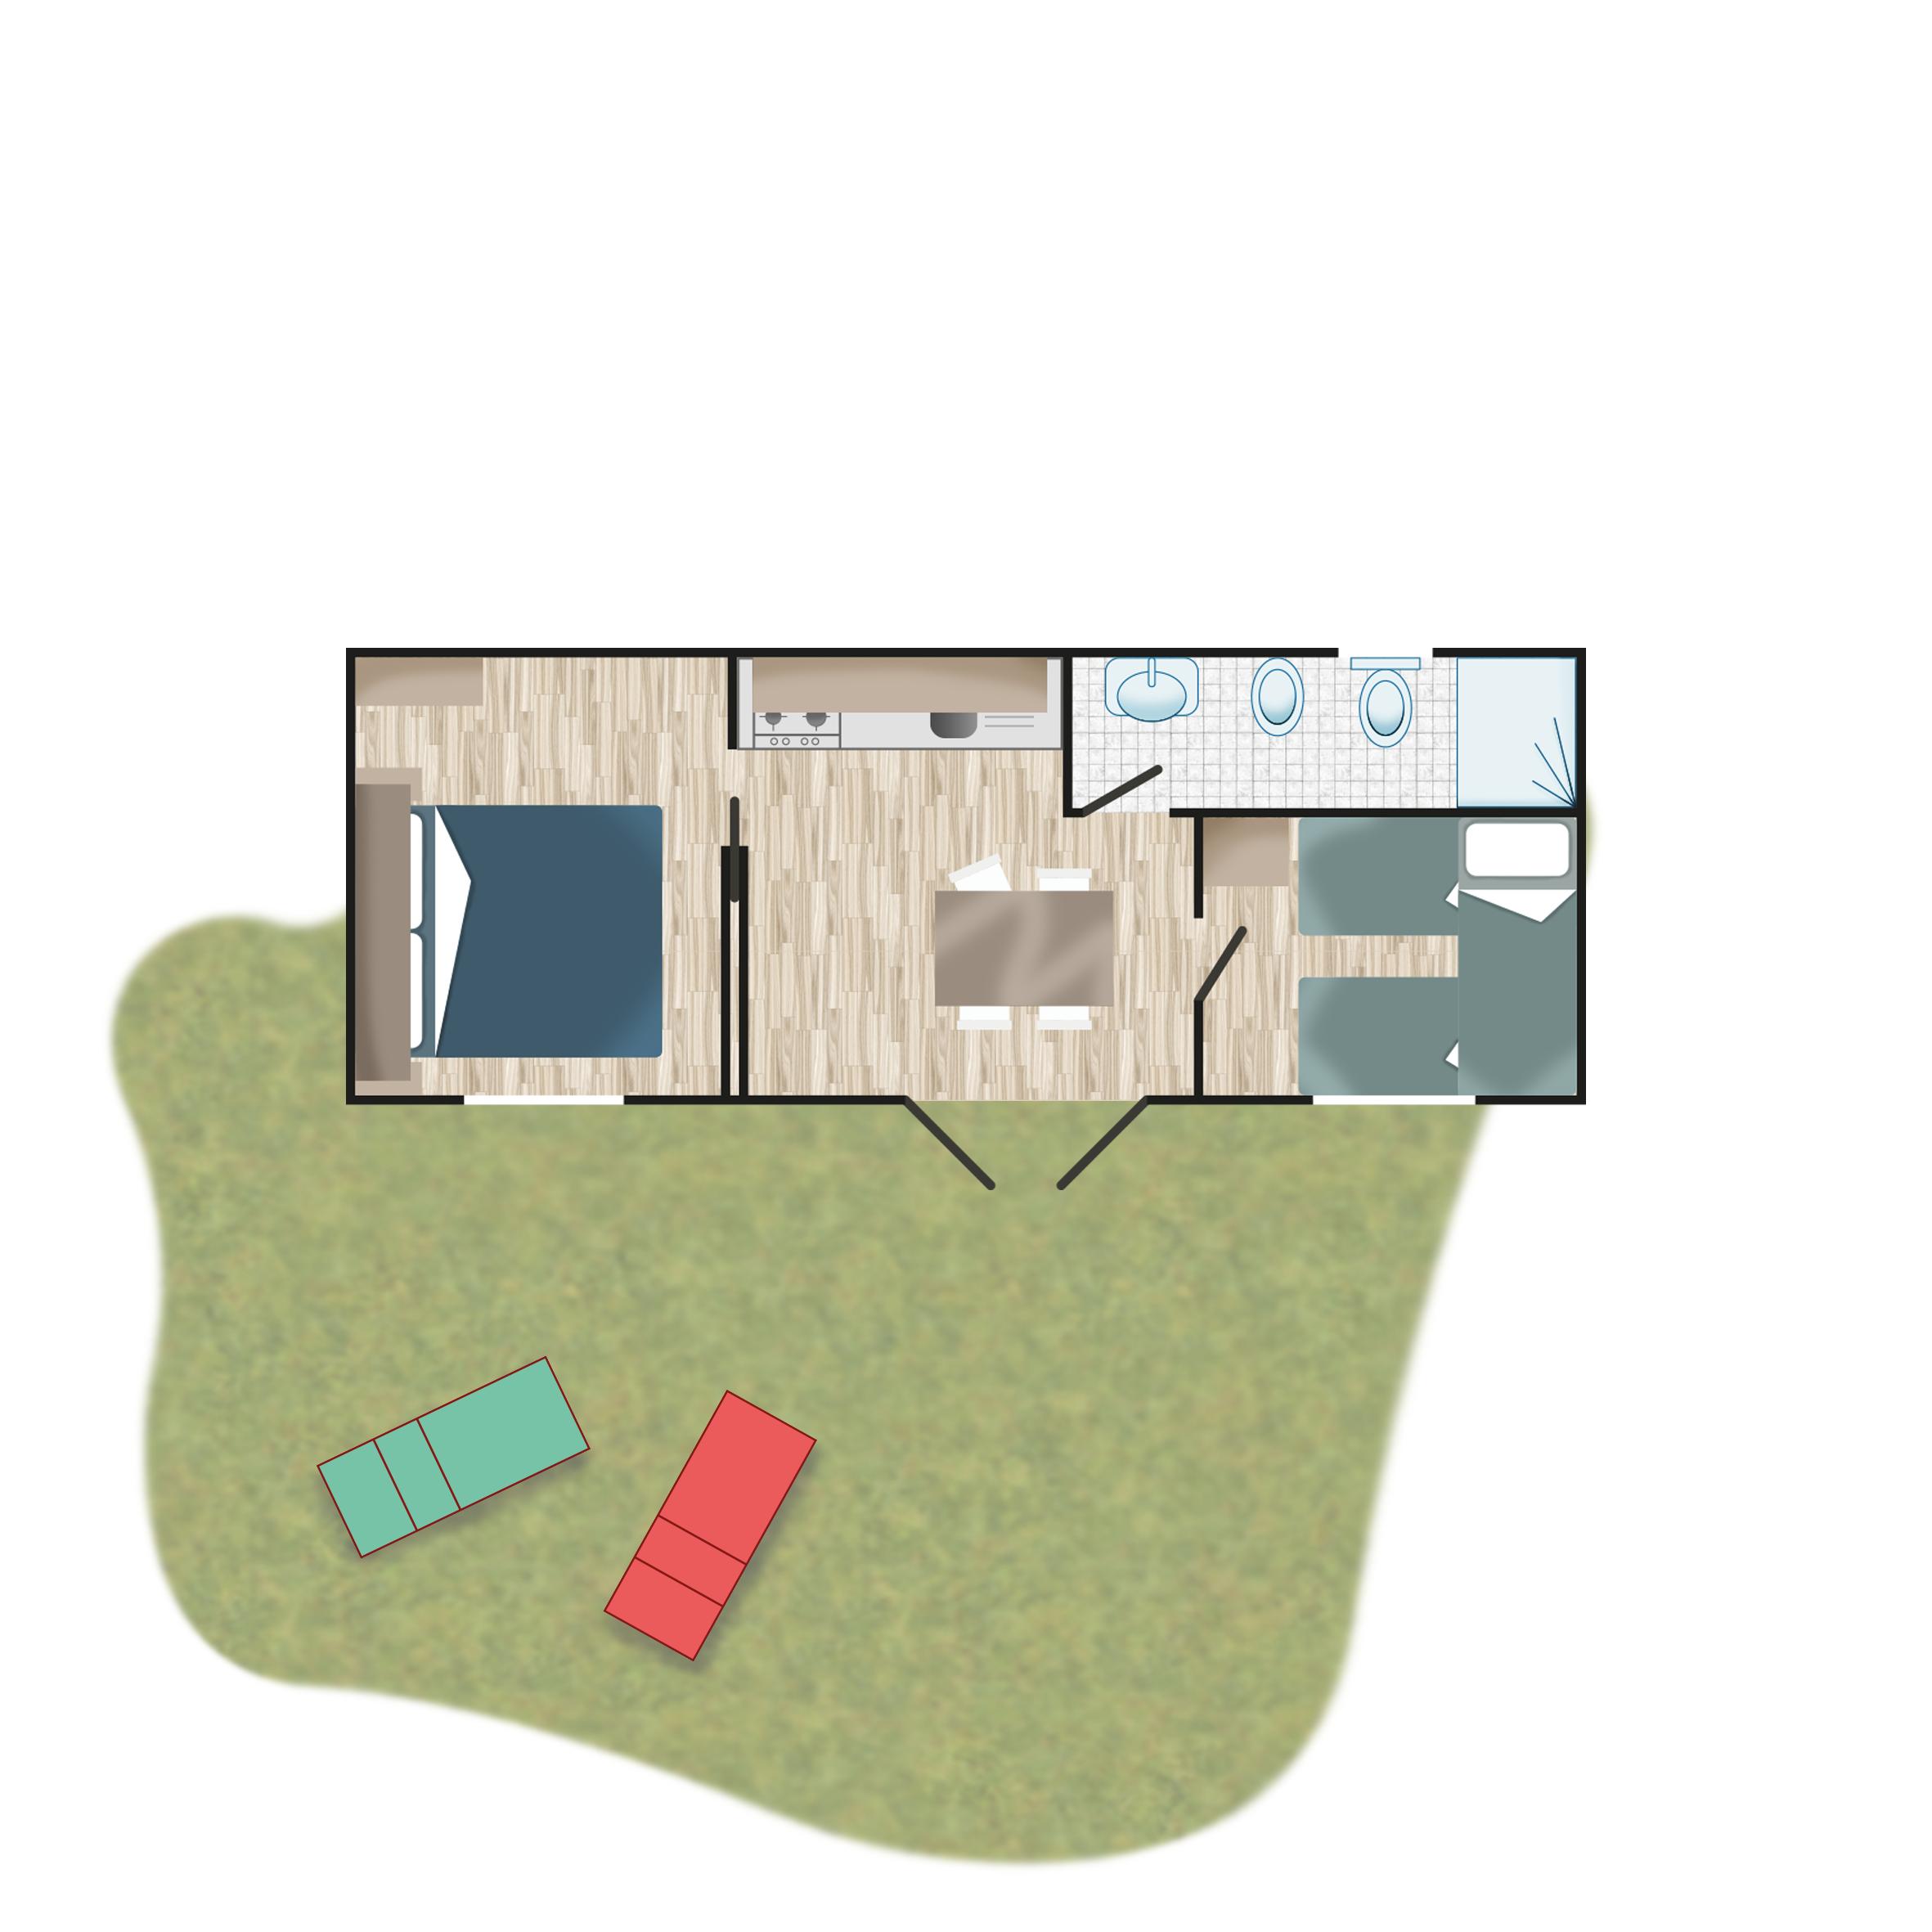 Piantina - Casa mobile Classic | Camping Adriatico